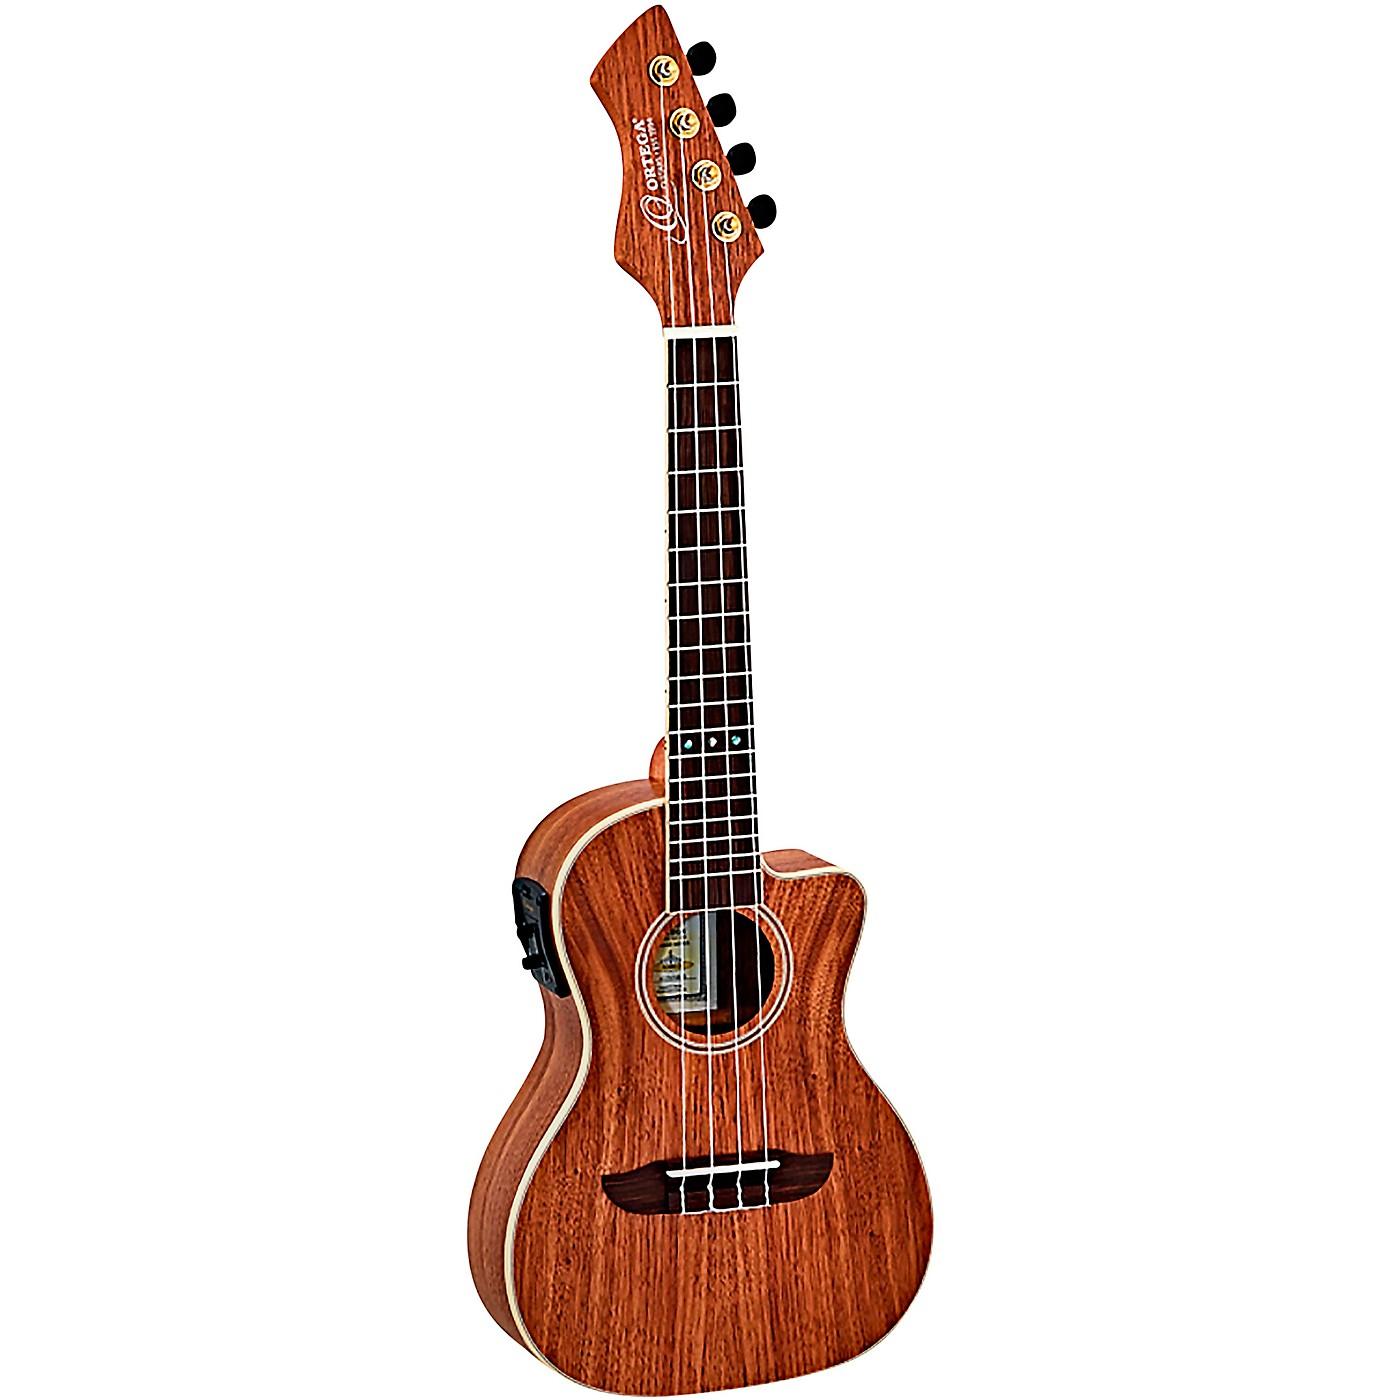 Ortega Horizon Series RUWN-CE Walnut Concert Acoustic-Electric Ukulele thumbnail